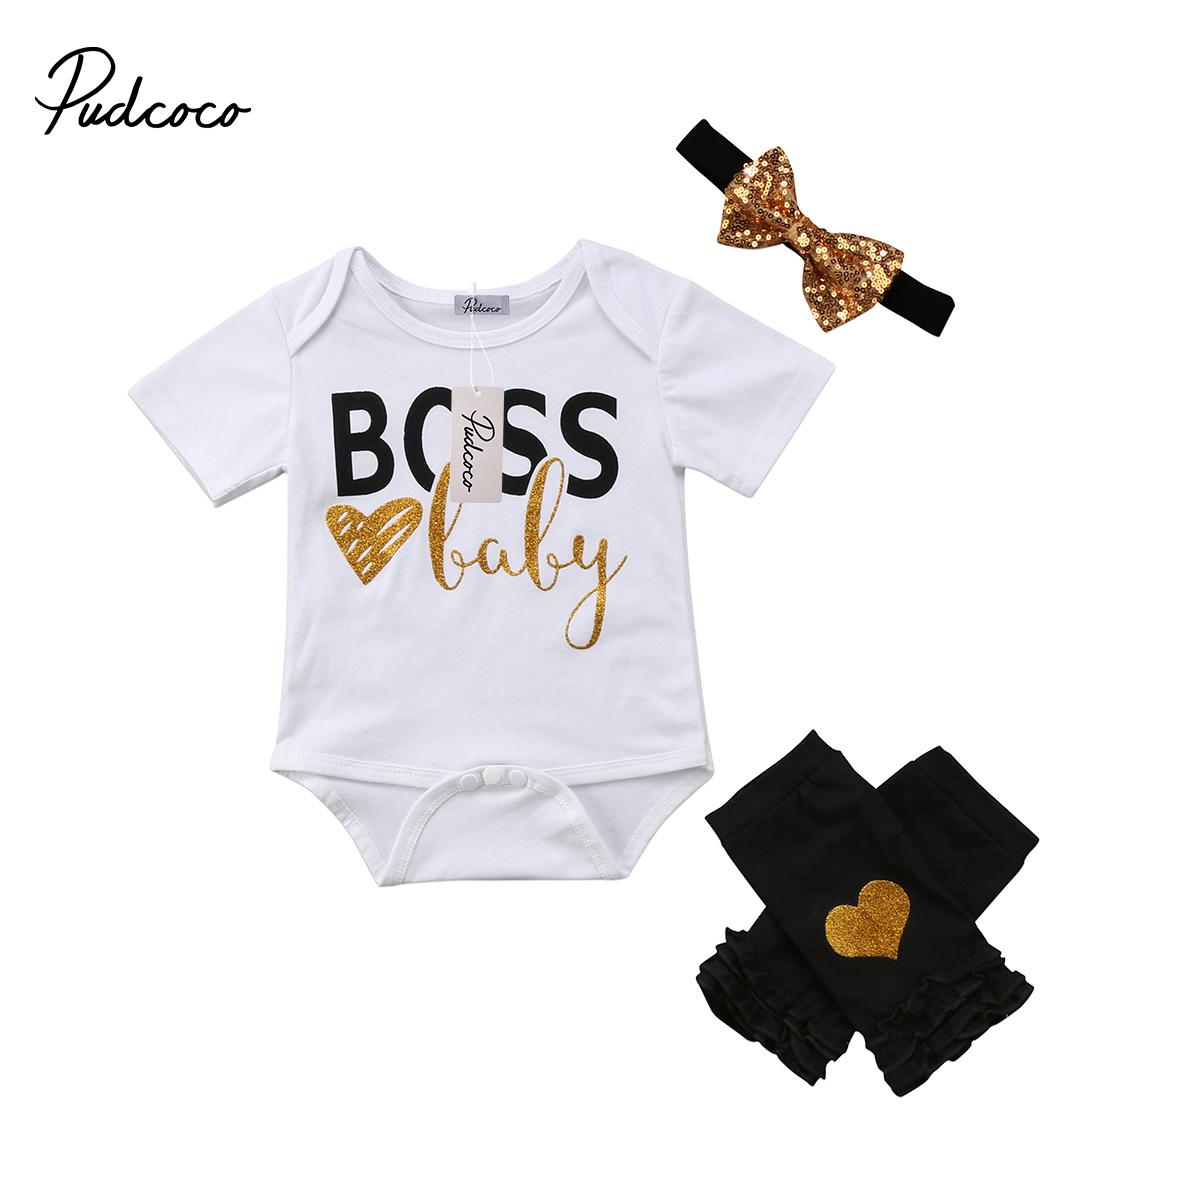 4 Stks Set Stijlvolle Pasgeboren Baby Meisjes Zomer Kleding Boss Baby Print Korte Mouw Wit Romper Gouden Hart Been Warmer Outfits 2018